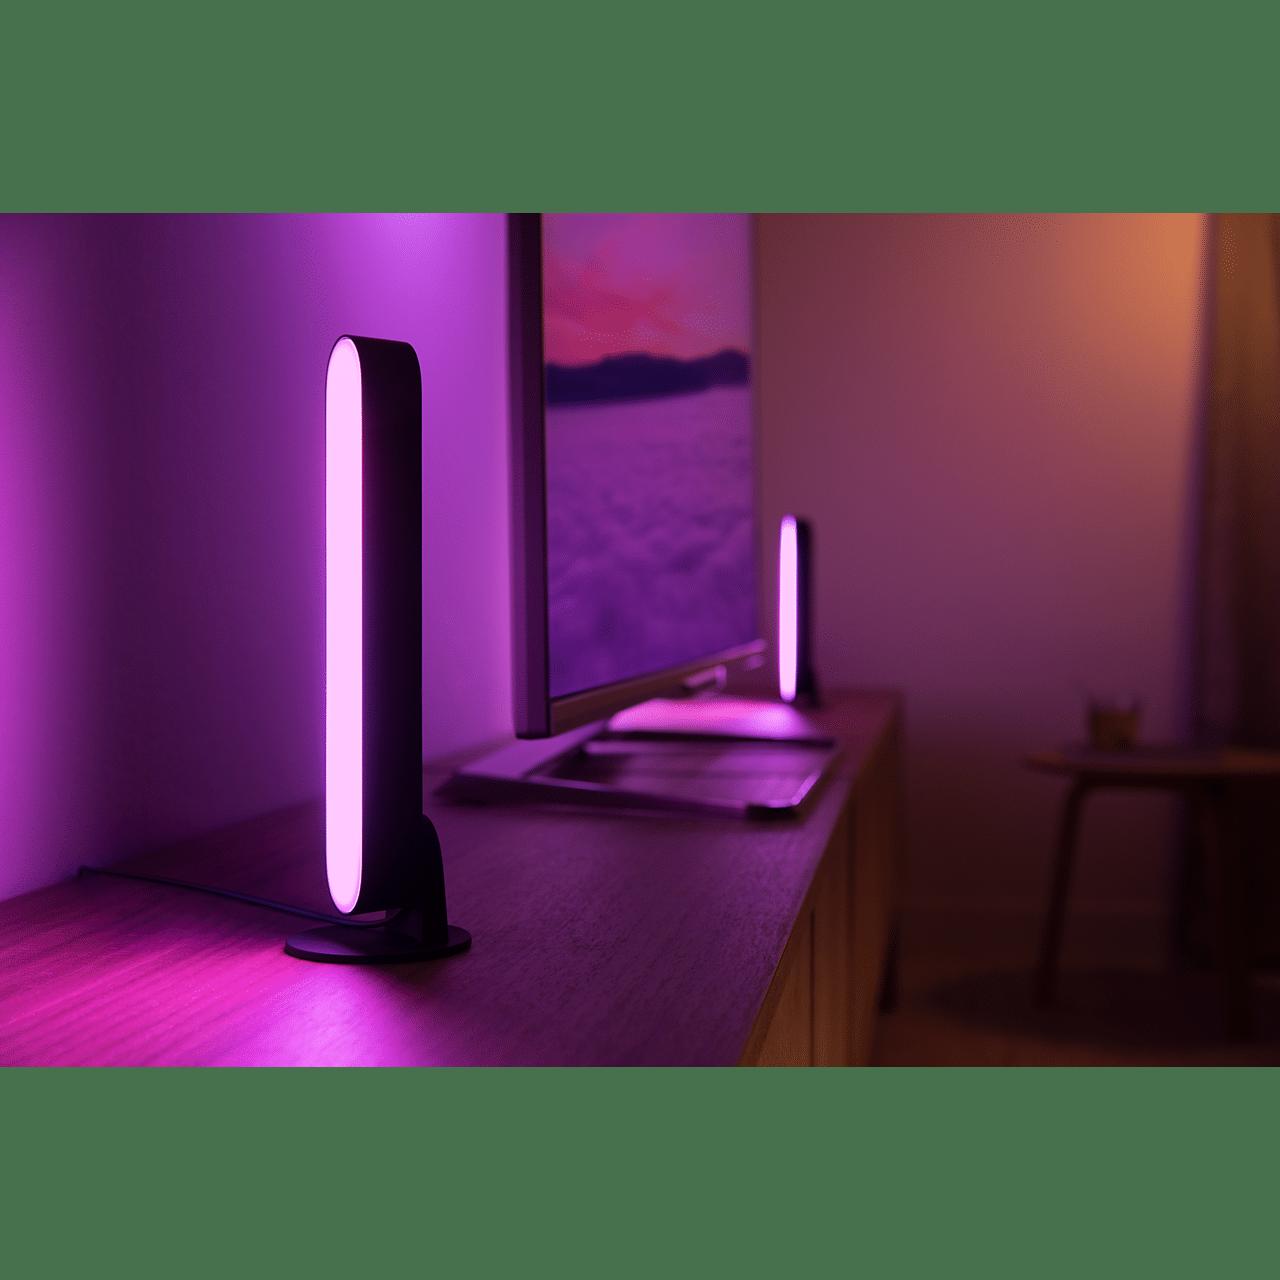 hue lampen und devolo kompatibel